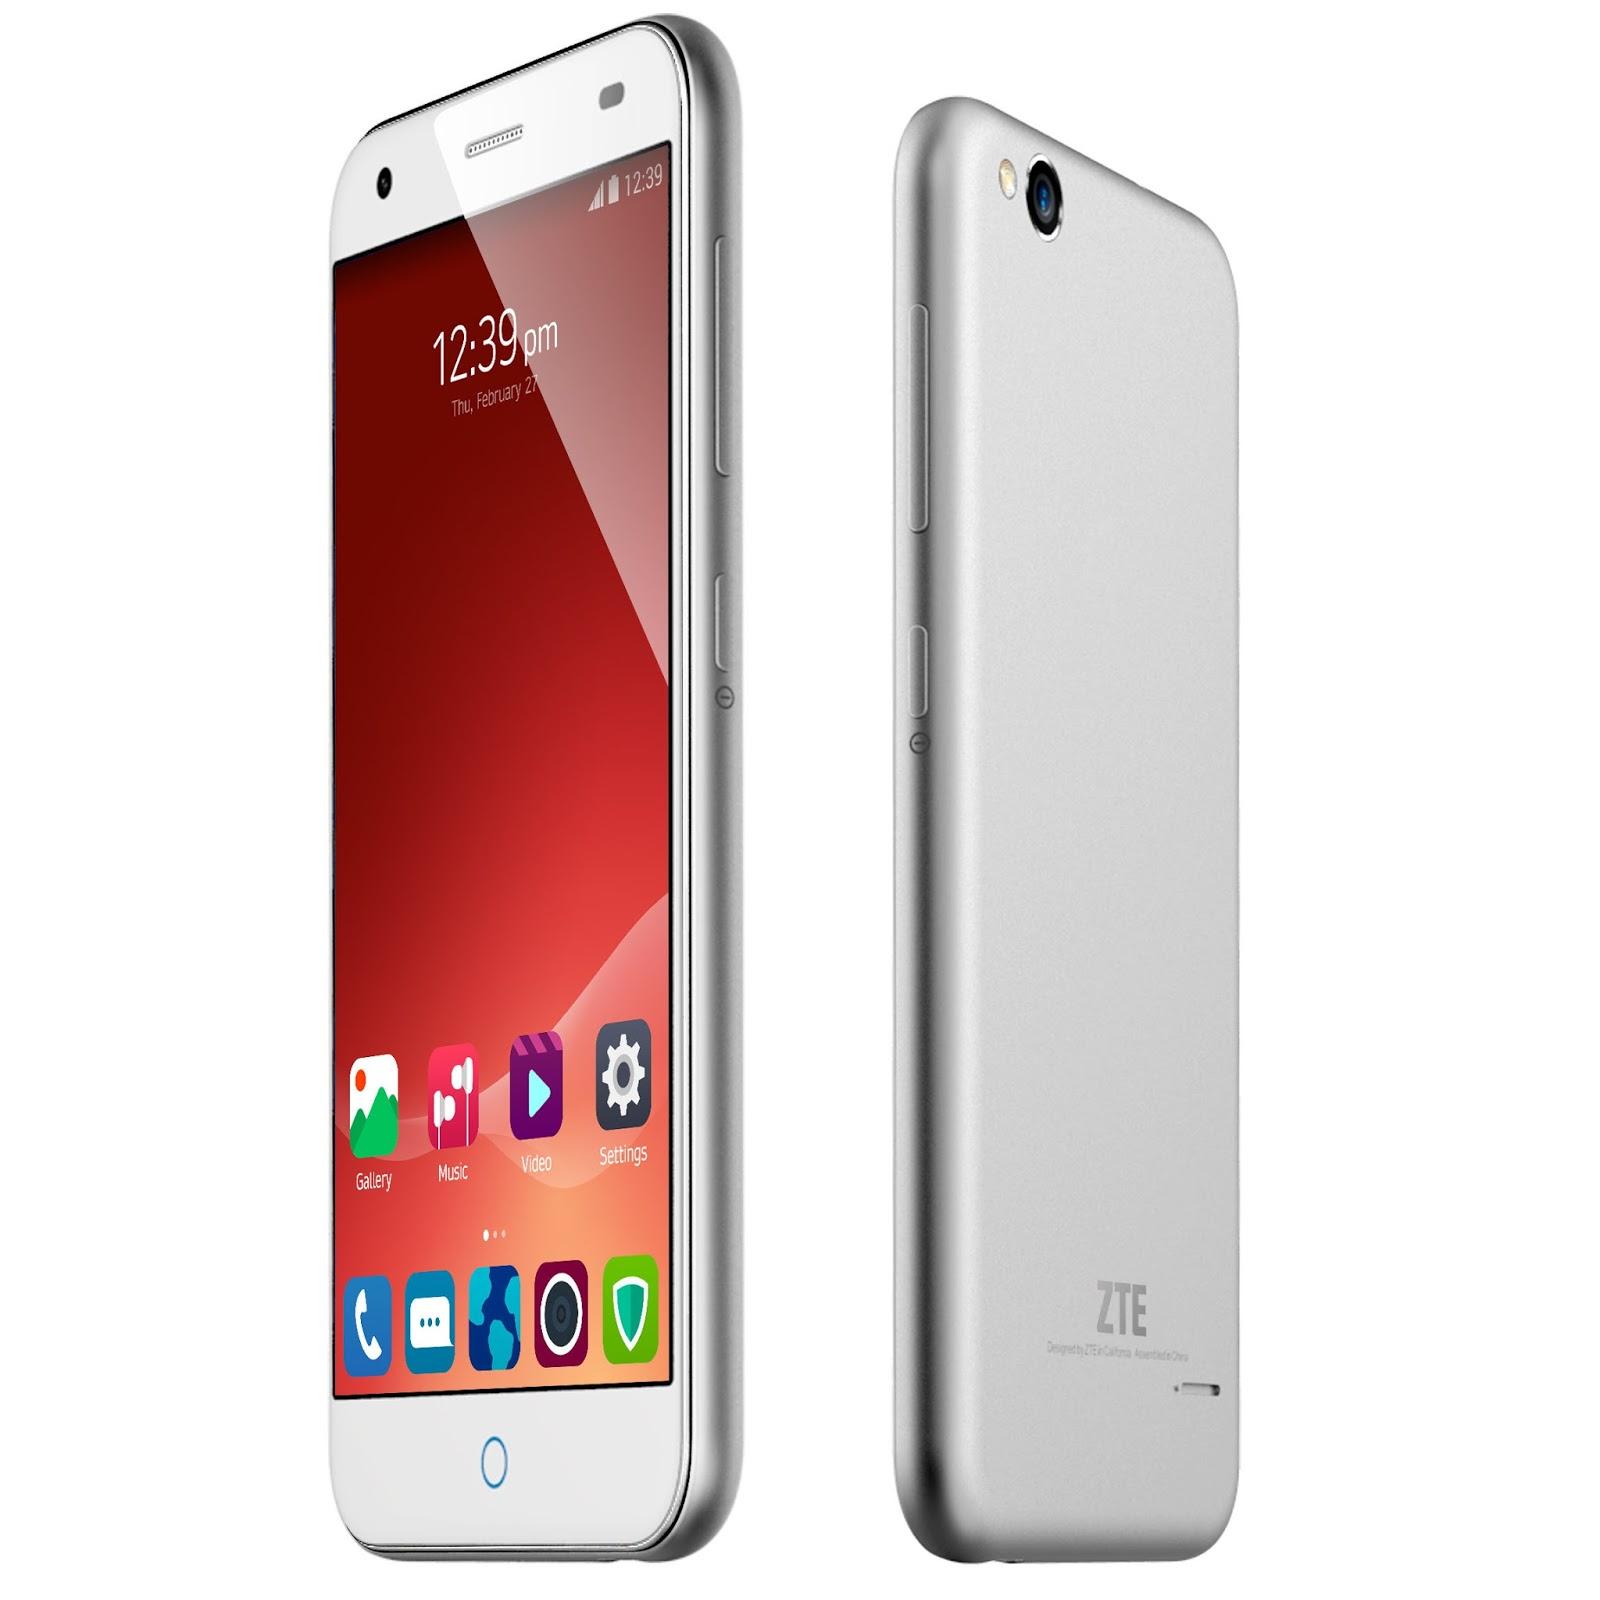 ZTE Blade S6, Kelas Menengah dengan 4G Plus Octa-core Snapdragon 64 bit